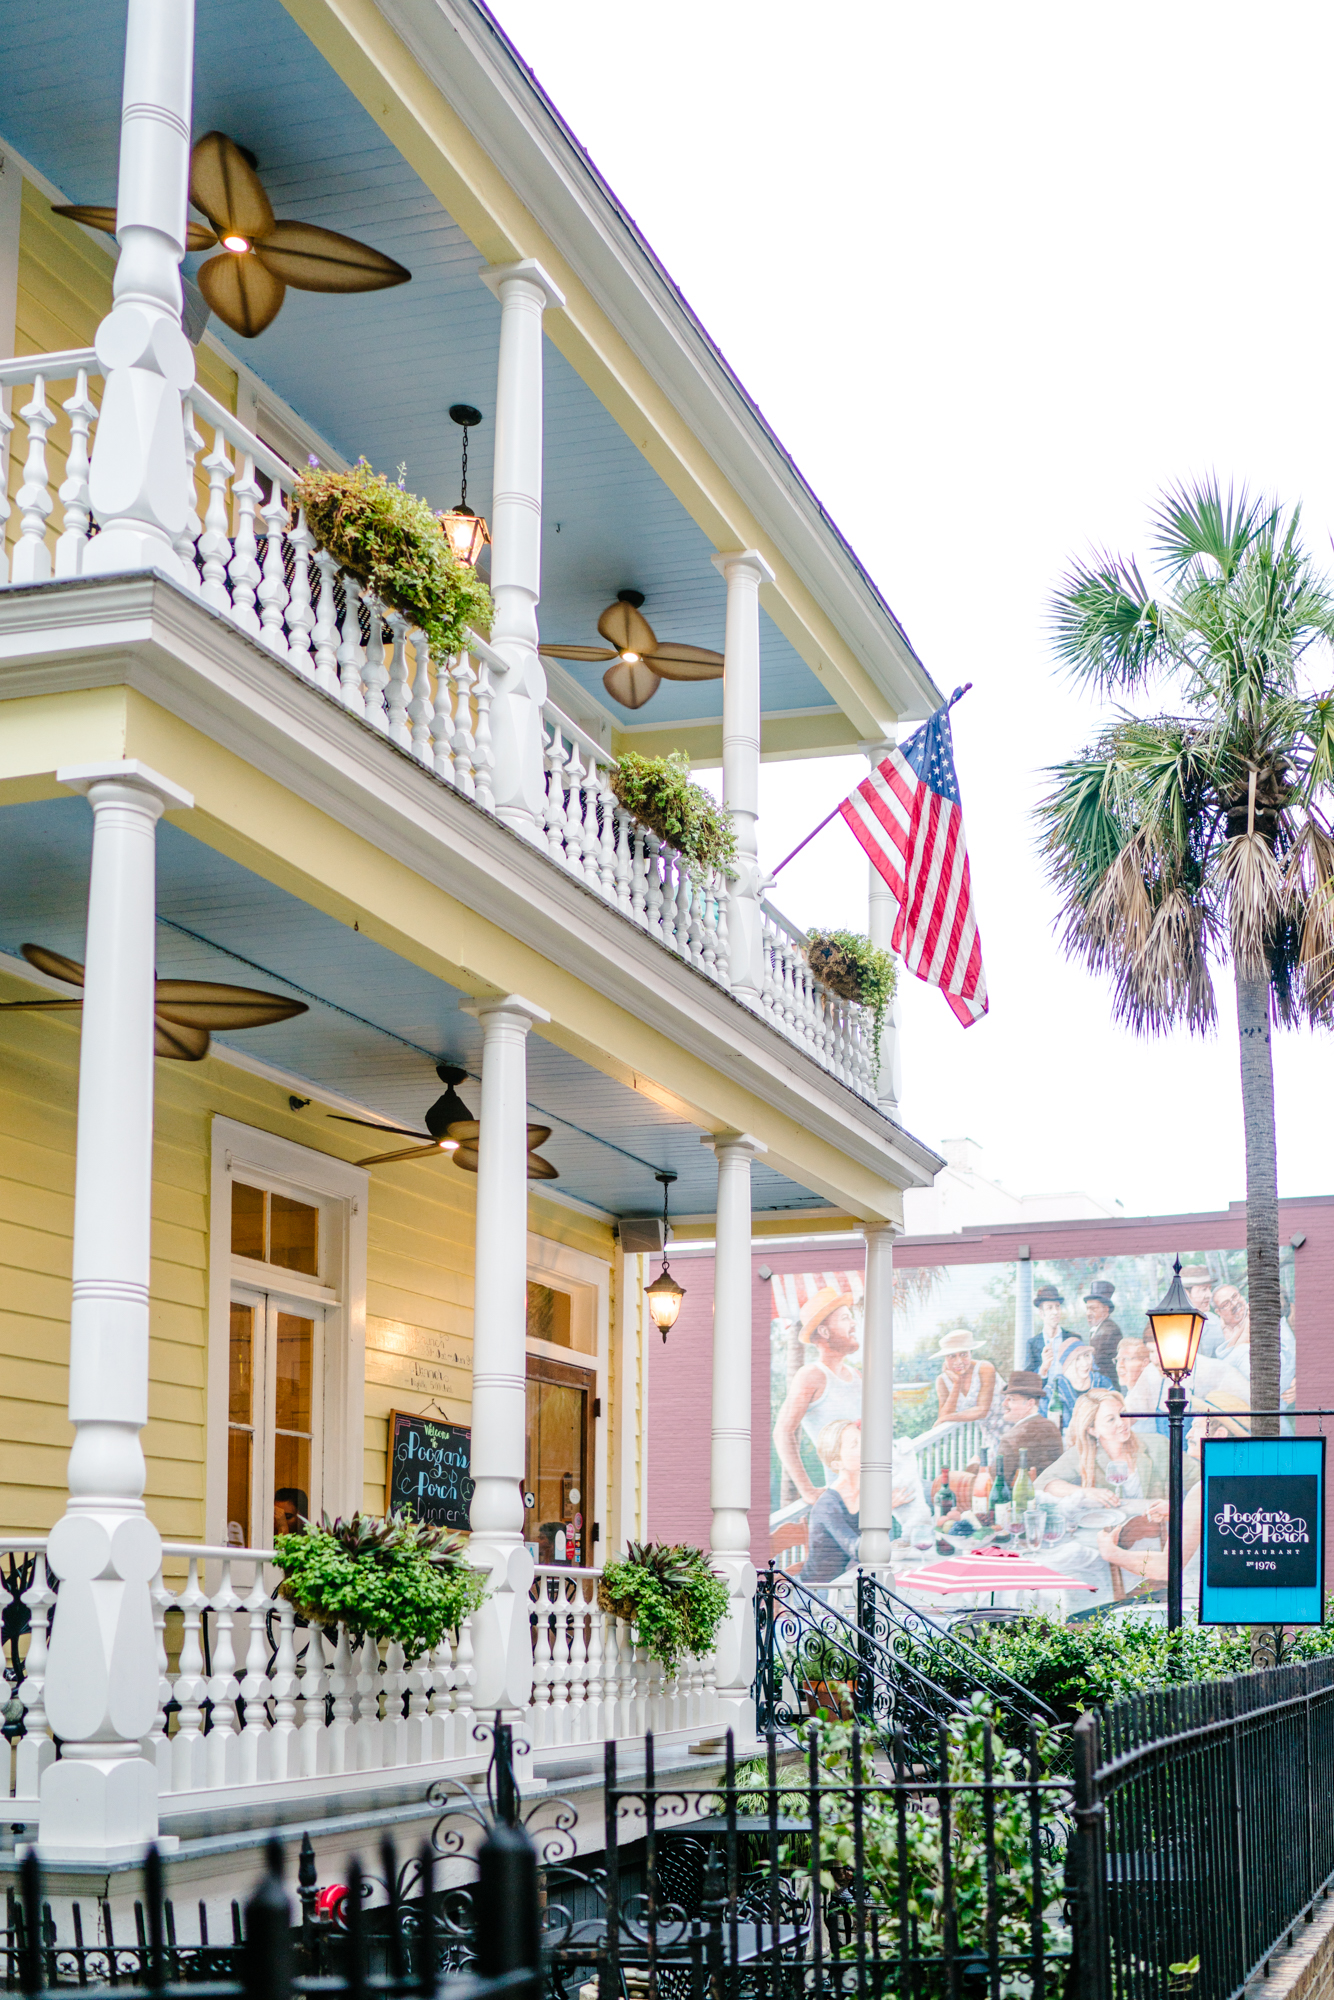 Poogan's Porch Charleston | Never Settle Travel